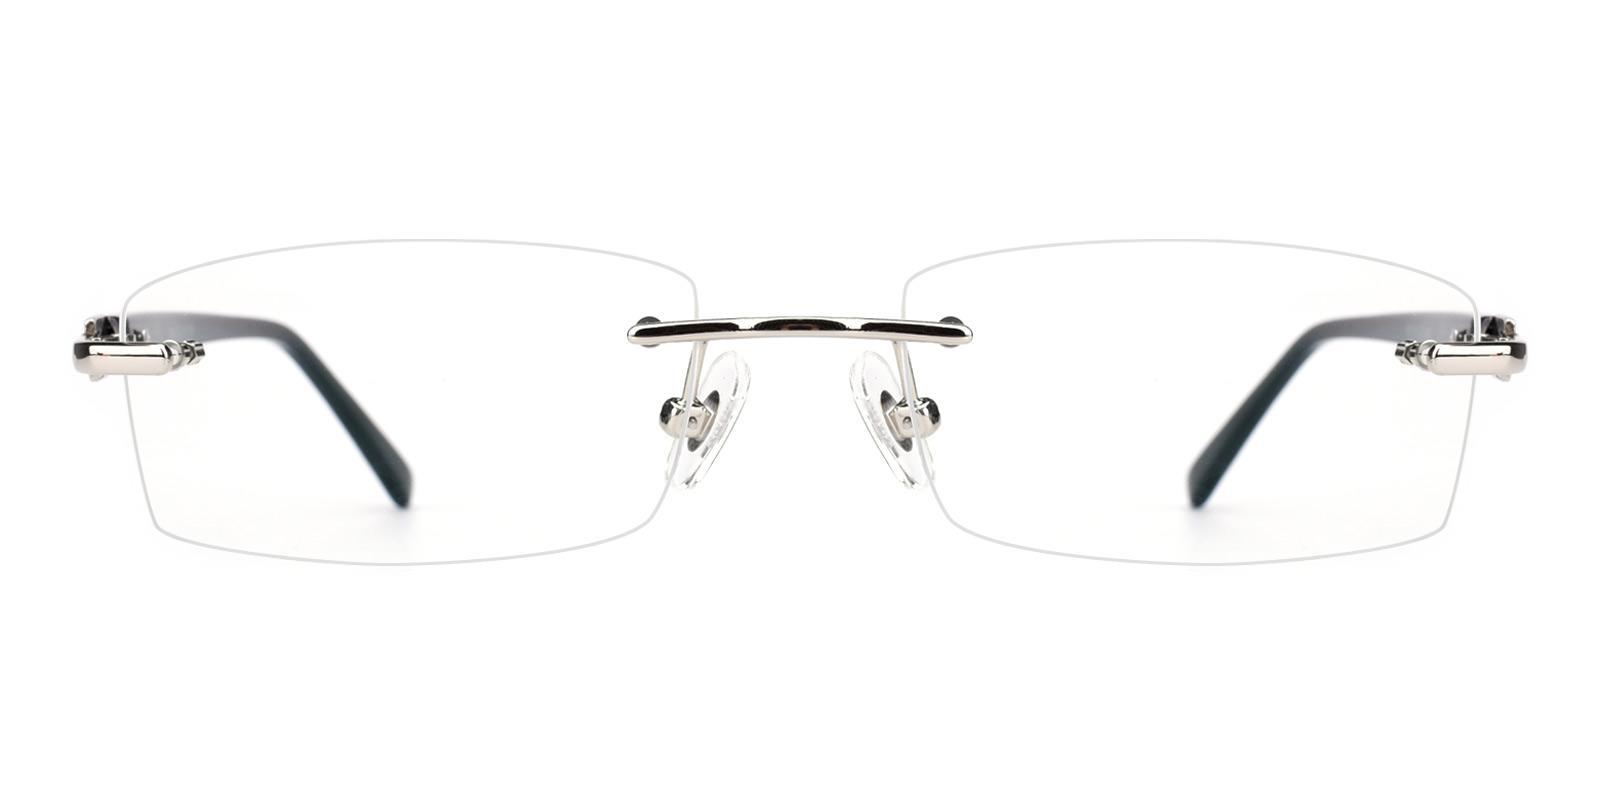 Cement-Silver-Rectangle-Acetate / Metal-Eyeglasses-detail